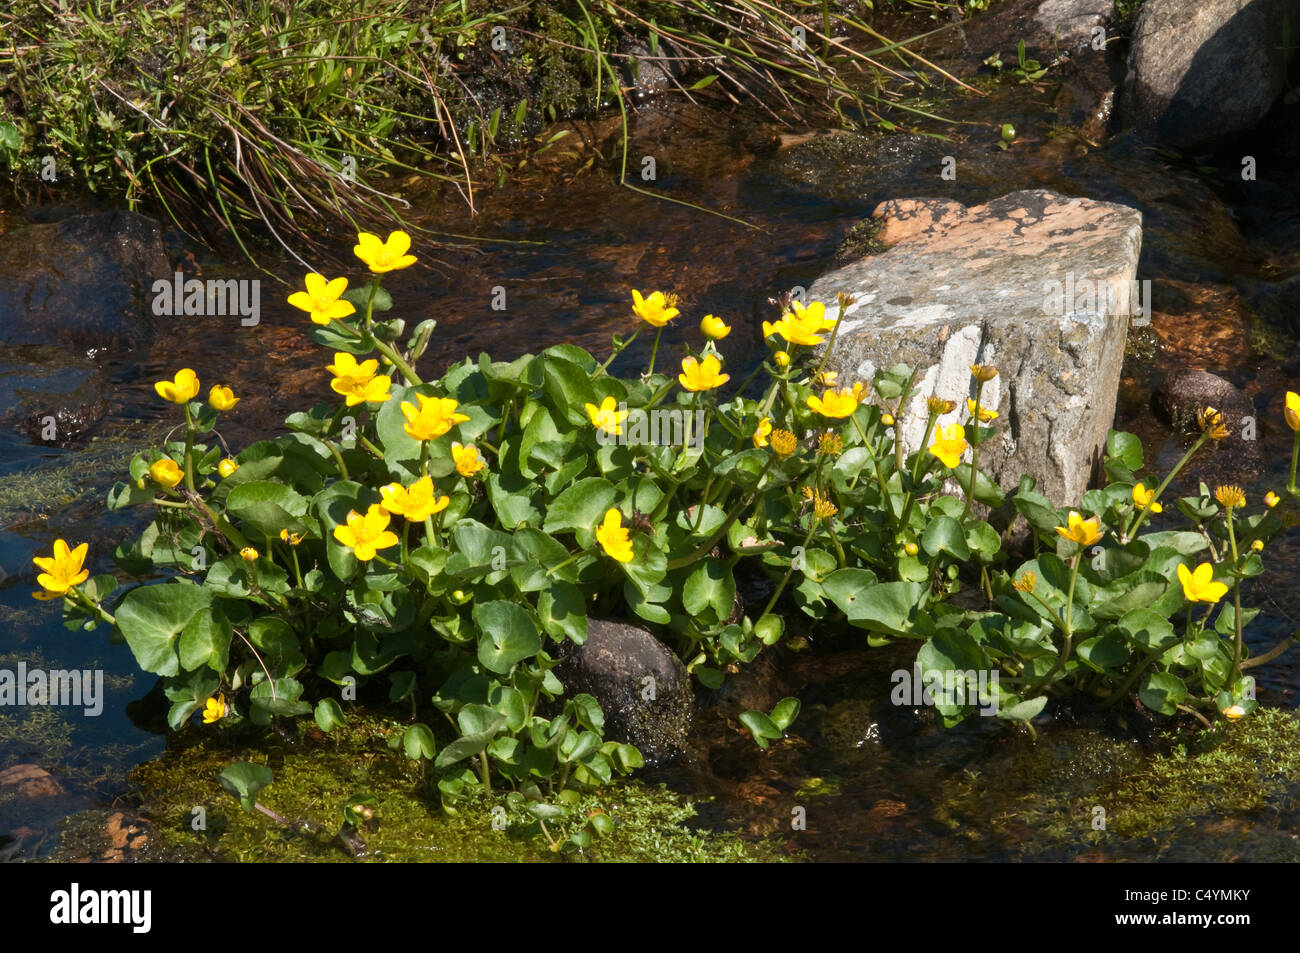 Kingcup = Marsh Marigold (Caltha palustris) flowers at the stream edge Unst Shetland Subarctic Archipelago Scotland - Stock Image